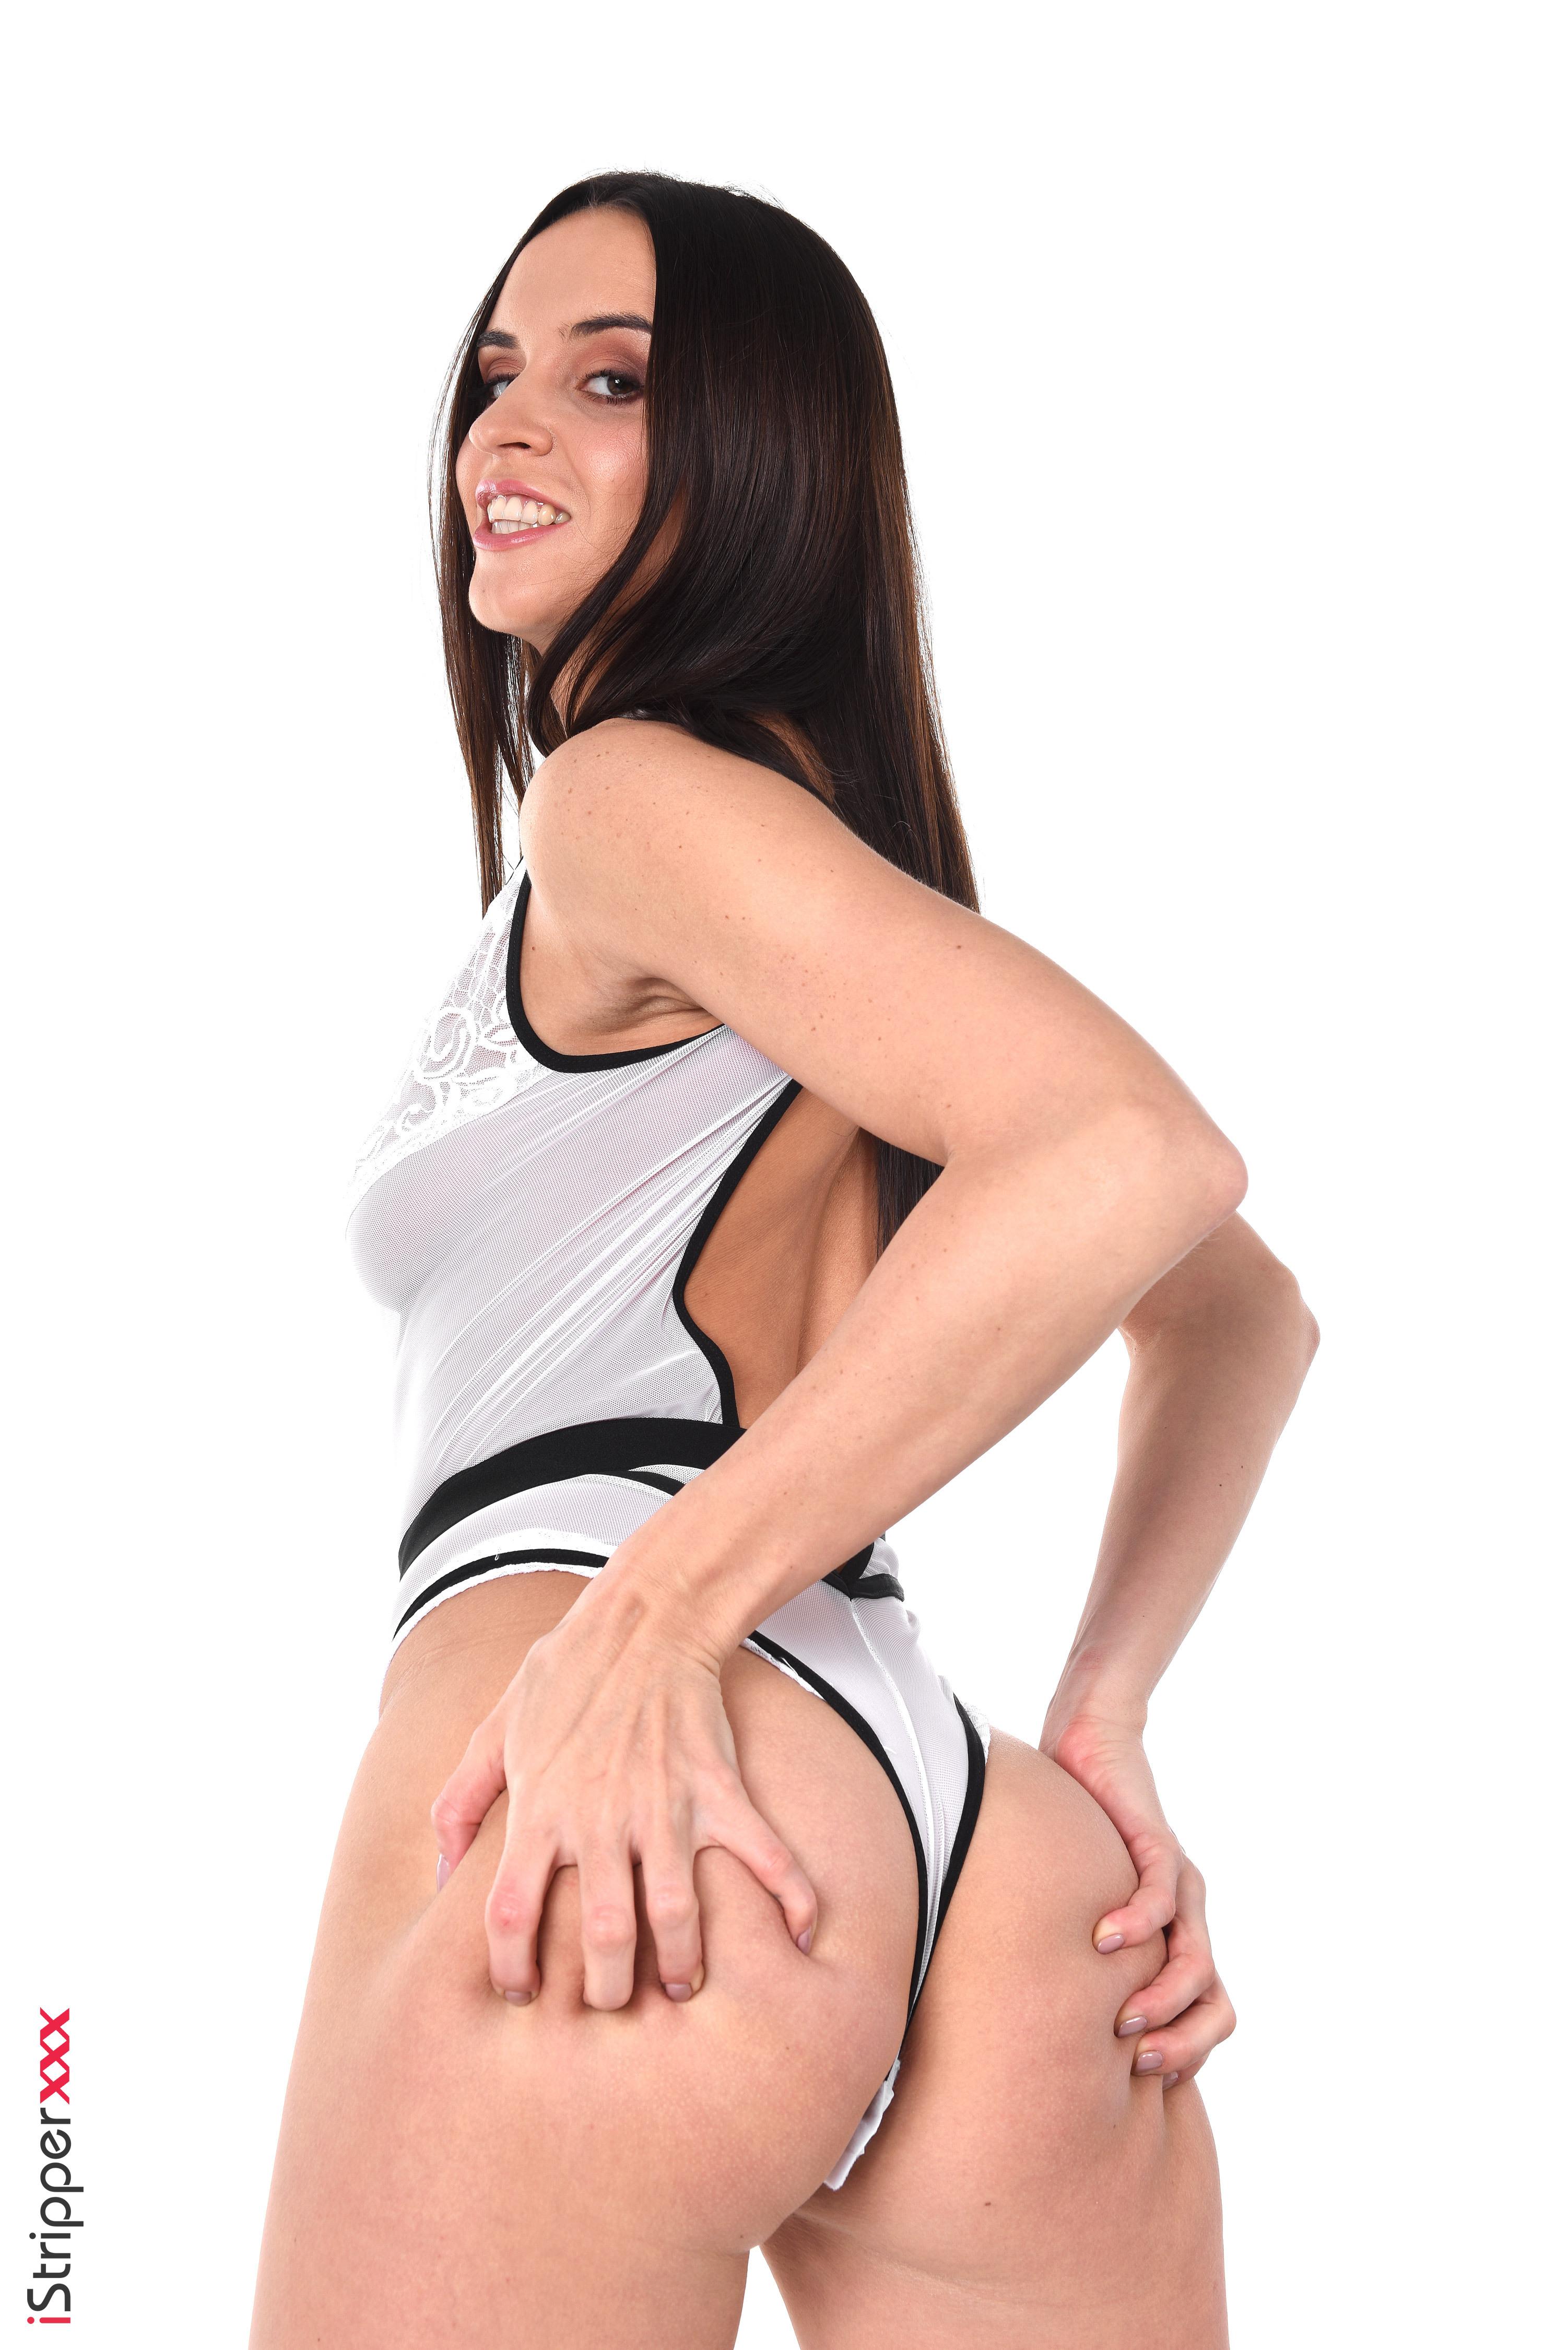 sexy lingere striptease gif